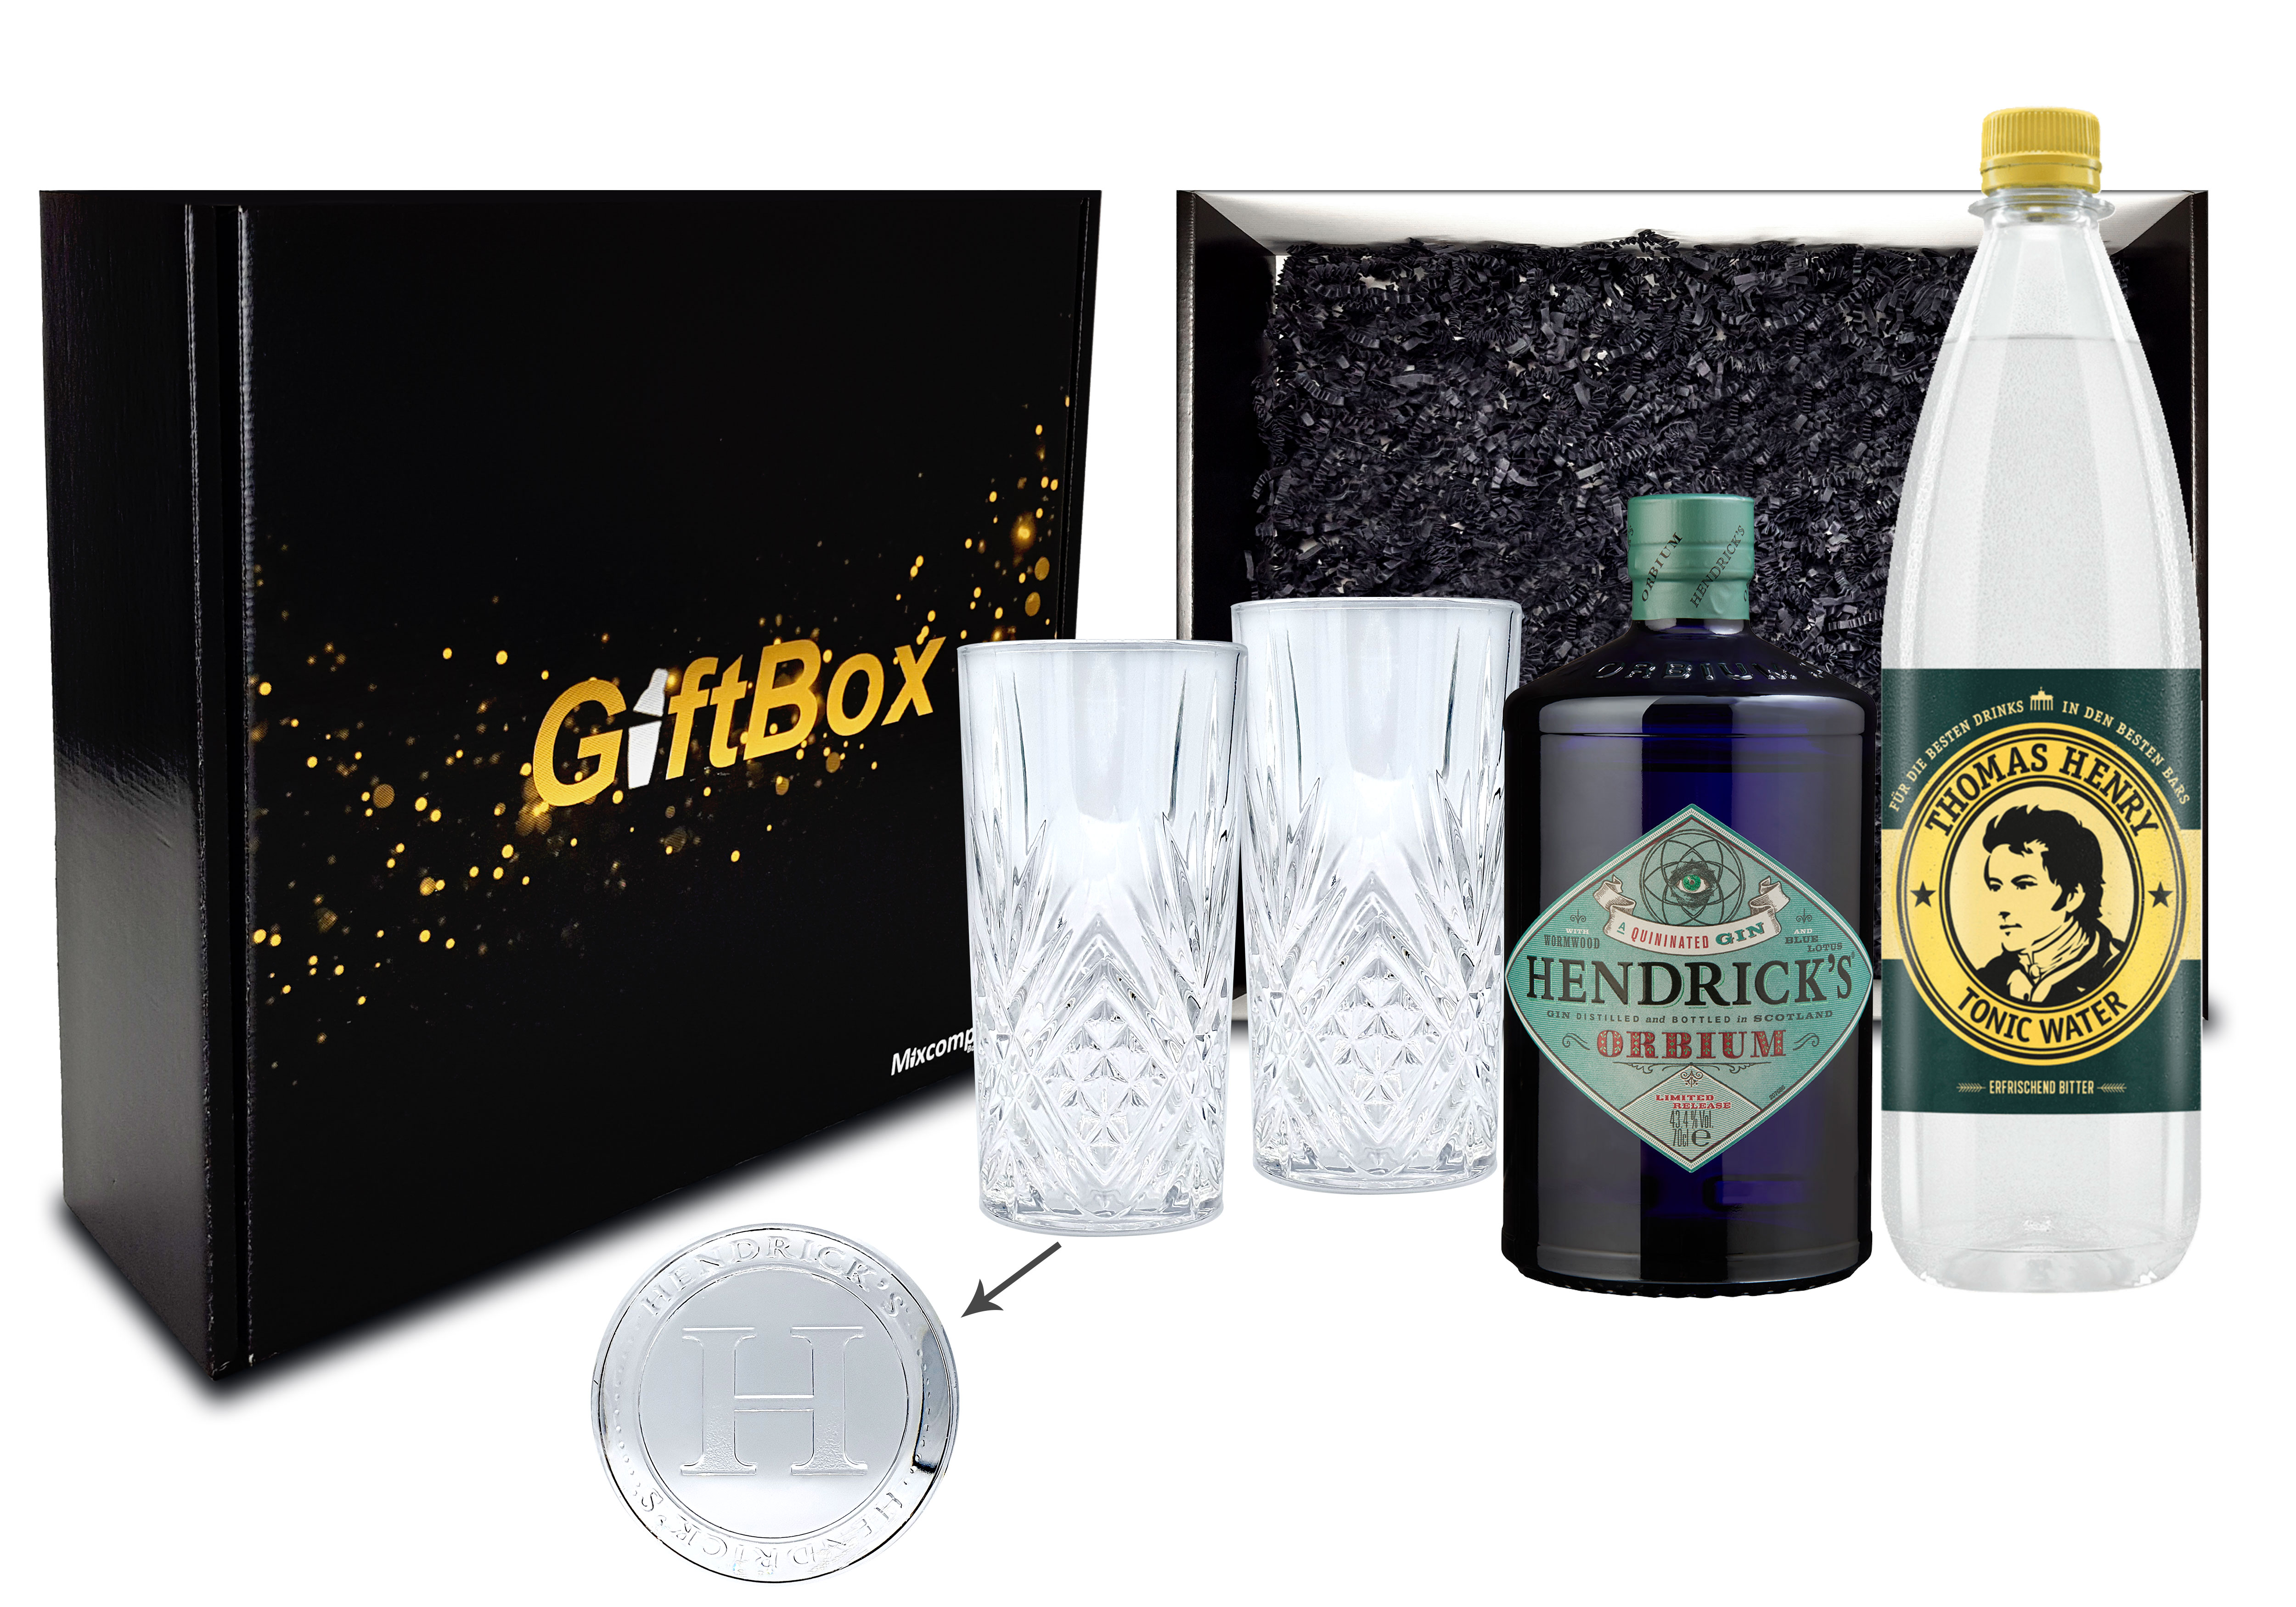 Hendricks Gin Tonic Geschenkset - Hendricks Orbium Gin 0,7L (43,4% Vol) + Thomas Henry Tonic Water 1L (inkl. Pfand MEHRWEG) + 2x Longdrink Gläser + Giftbox - [Enthält Sulfite]